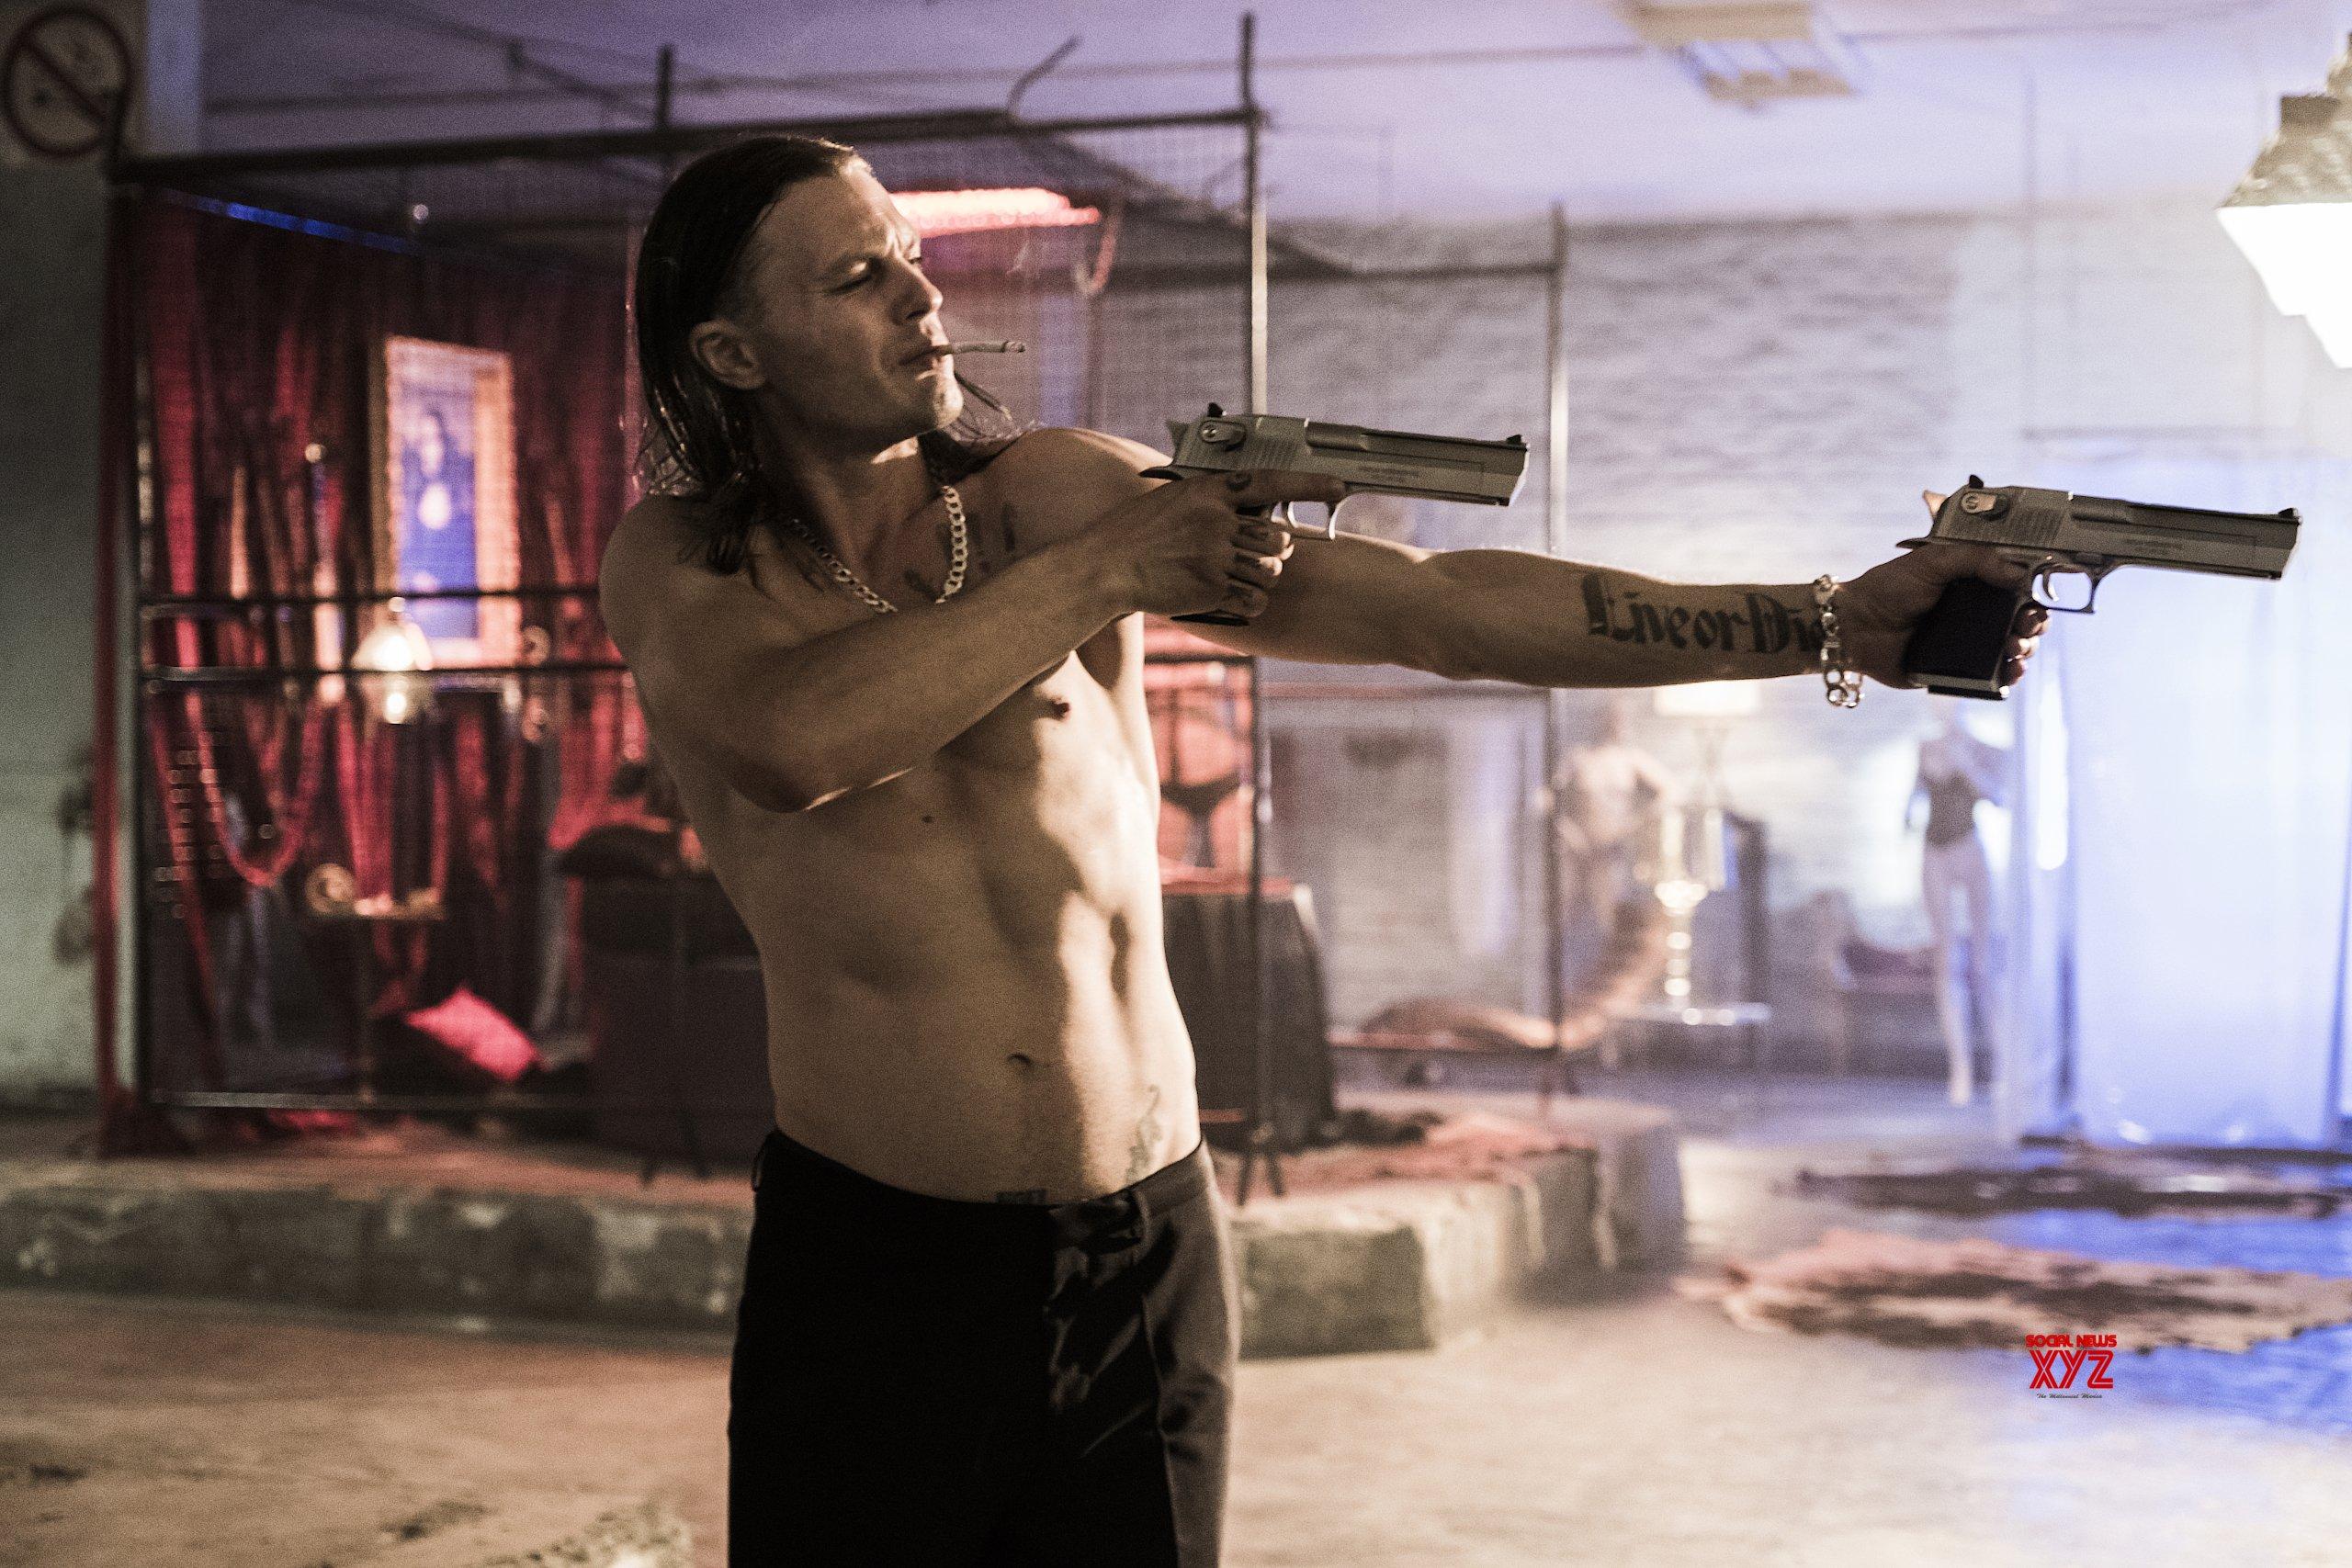 Netflix S The Last Days Of American Crime Movie Hd Stills Social News Xyz